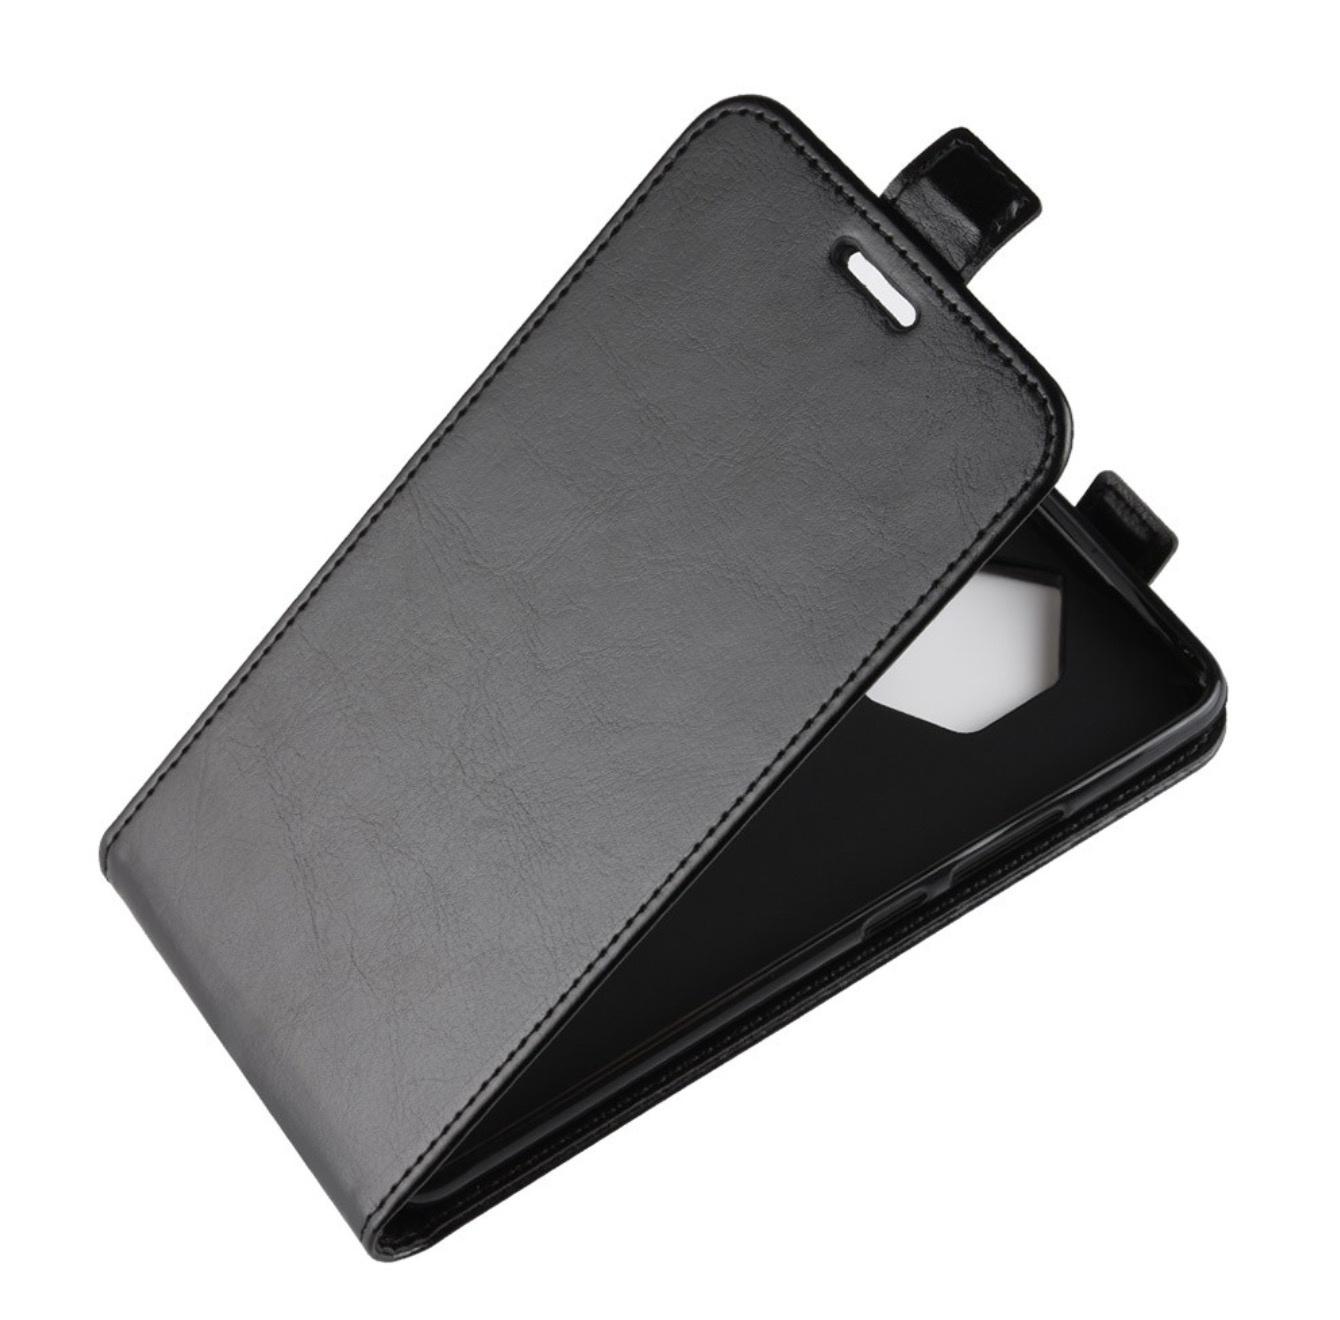 Чехол-флип MyPads для Sony Xperia SP M35h (C5302) вертикальный откидной черный tested replacement for sony xperia sp m35h lcd m35 m35i c5302 c5303 screen display 1 piece free shipping high quality